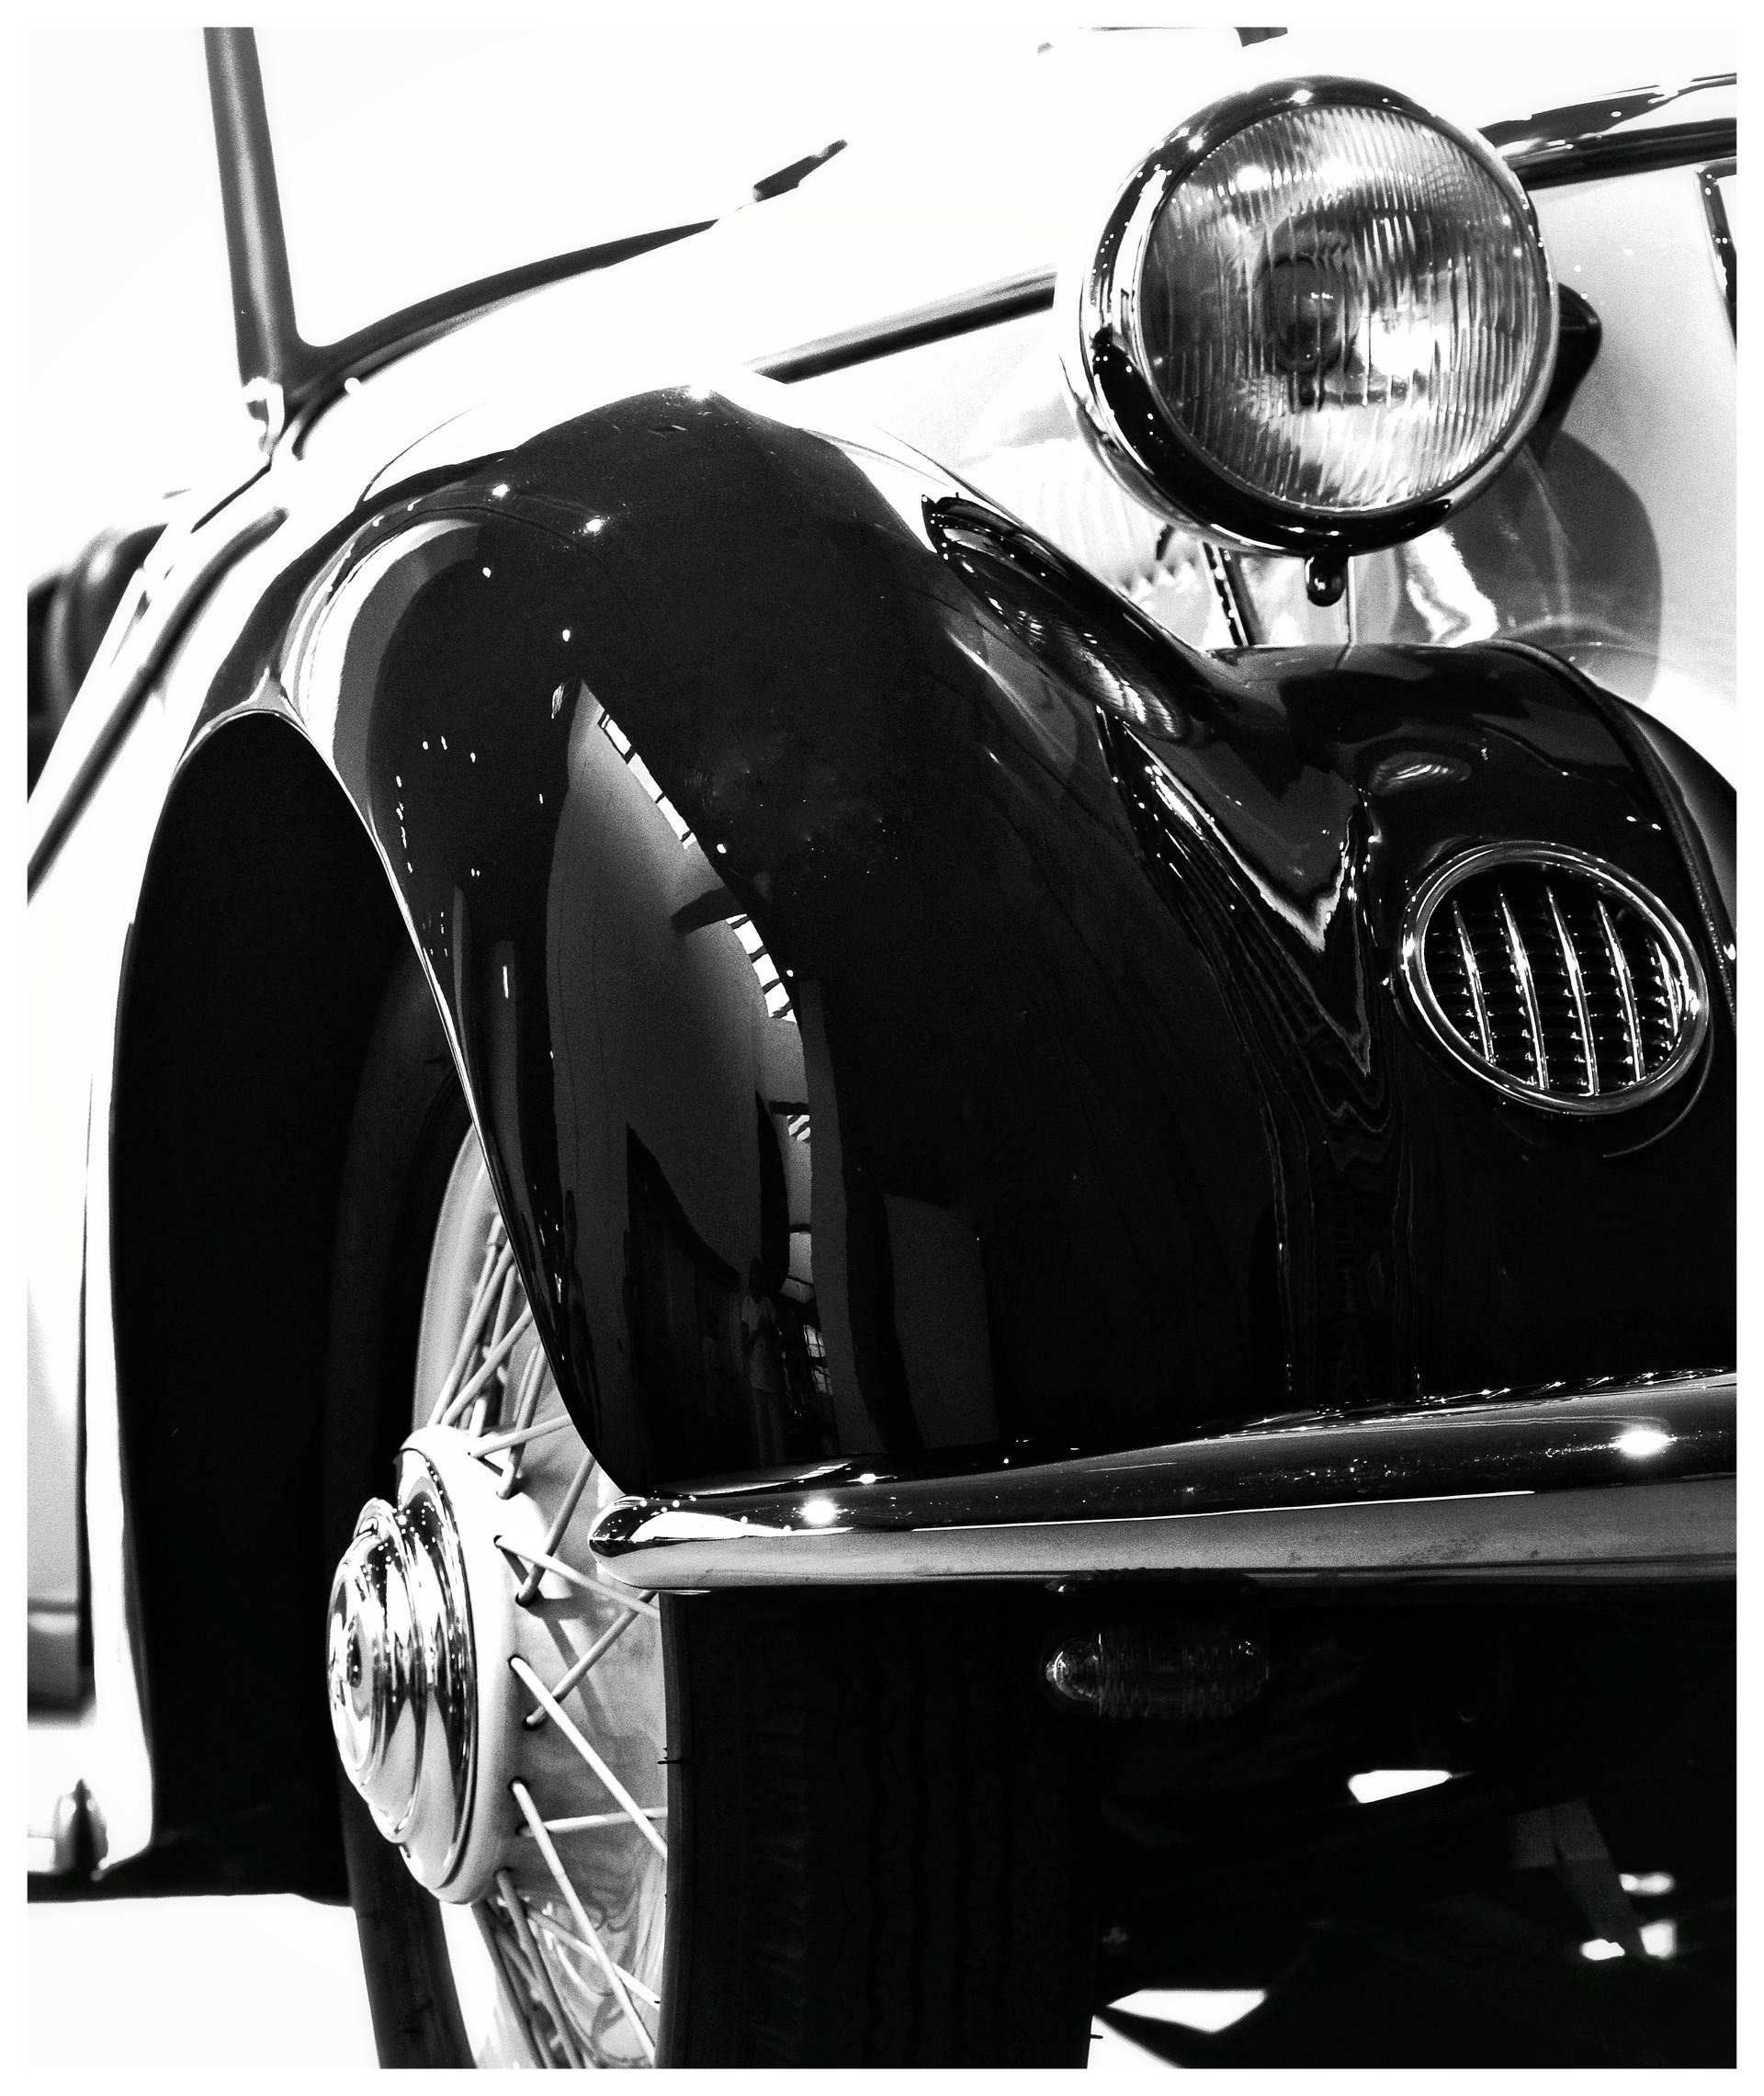 Vintage curves